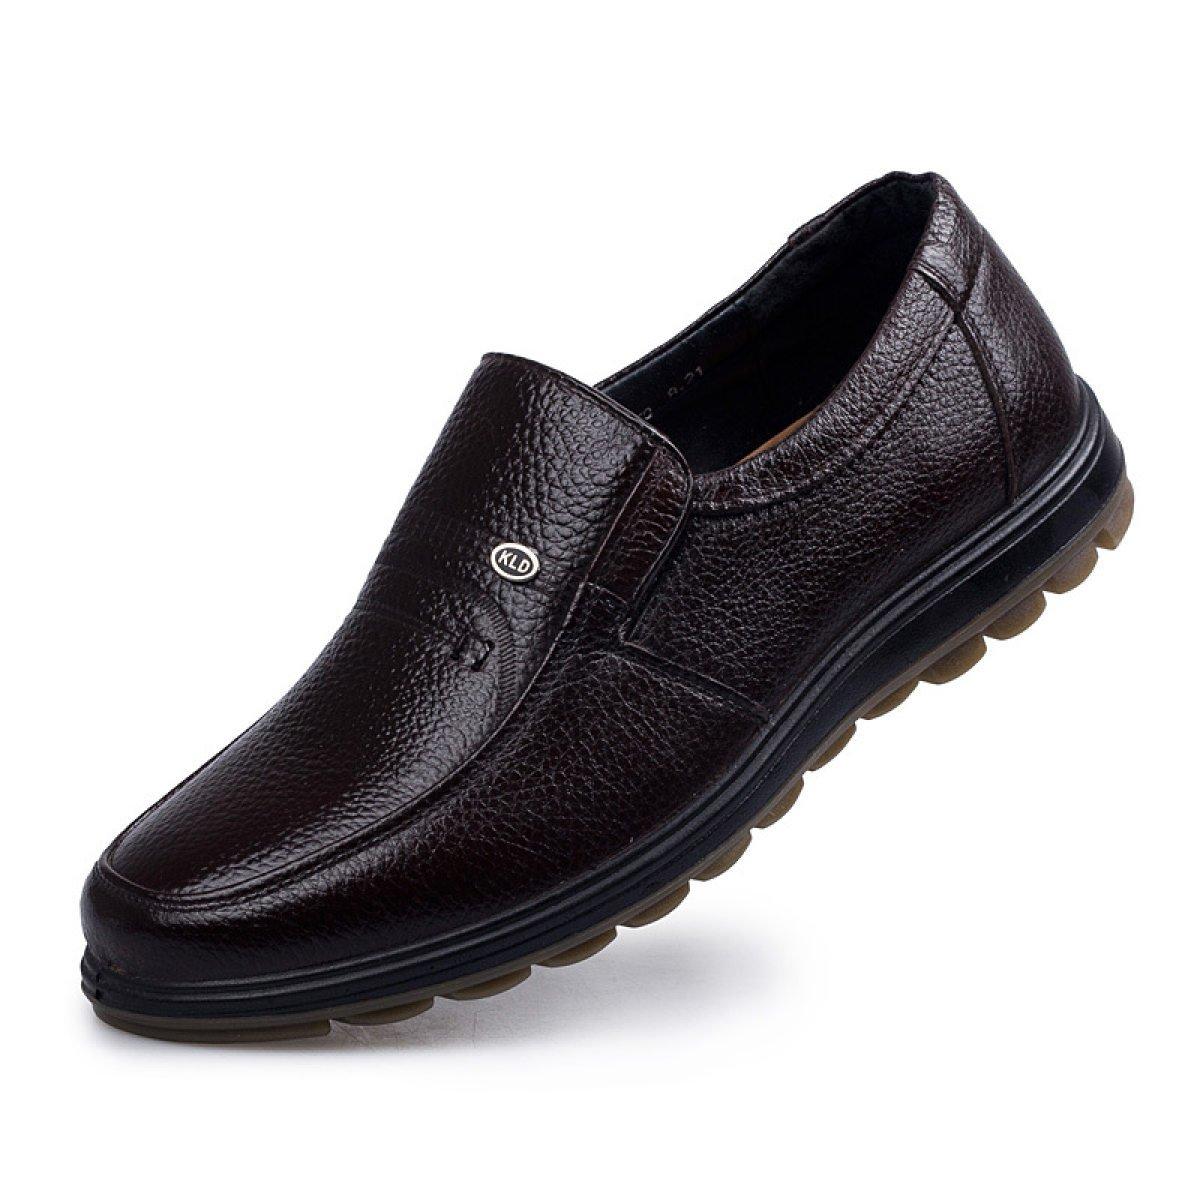 Classic Papa Schuhe Leder Business Casual Herrenschuhe Herren Lederschuhe Mittleren Alters Mode Herrenschuhe